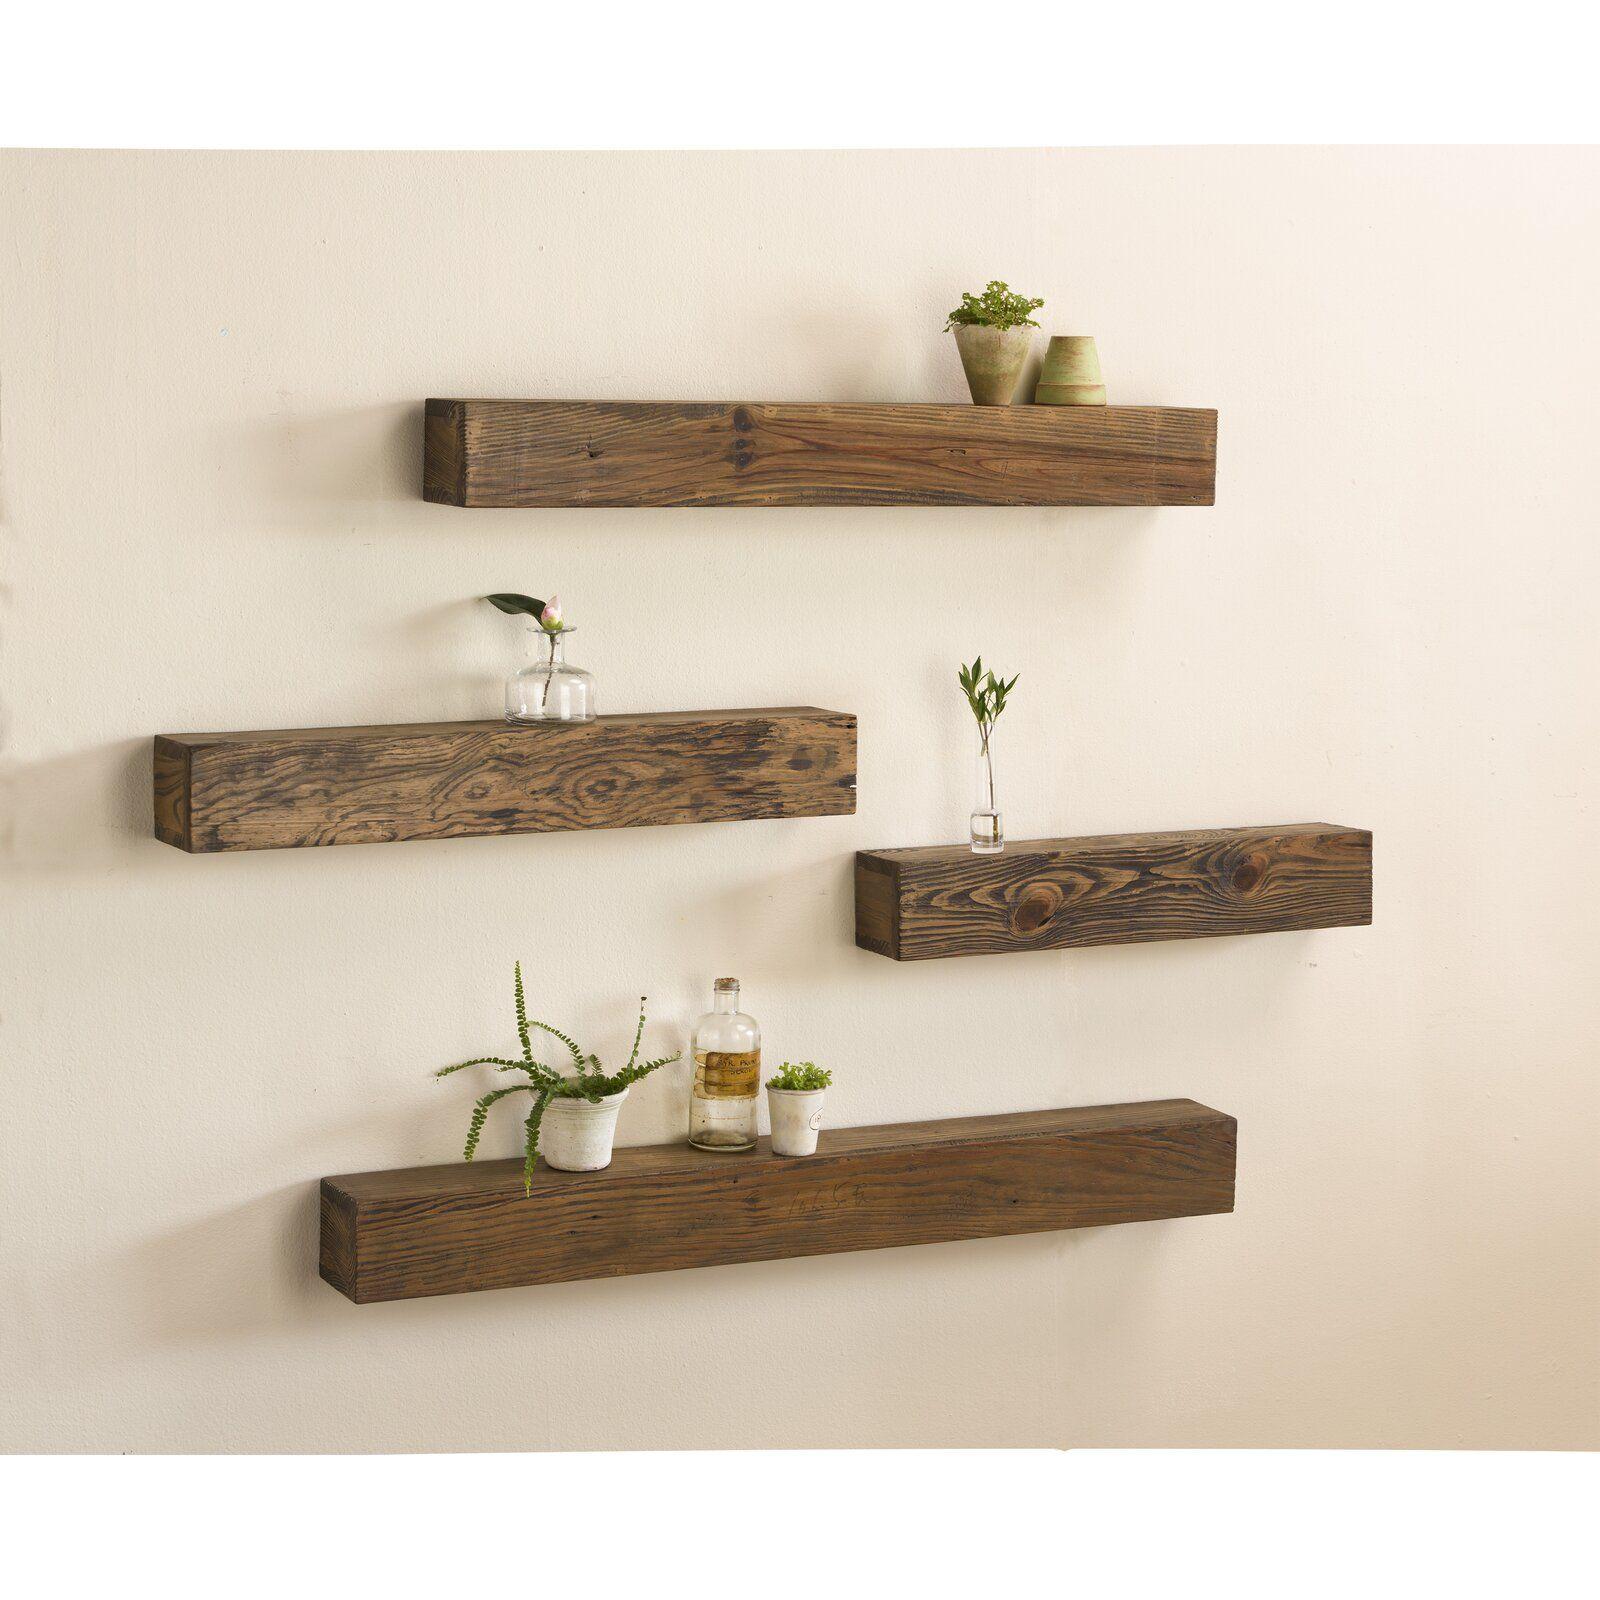 Rustic Wooden Wall Shelf Rustic Wooden Shelves Wood Floating